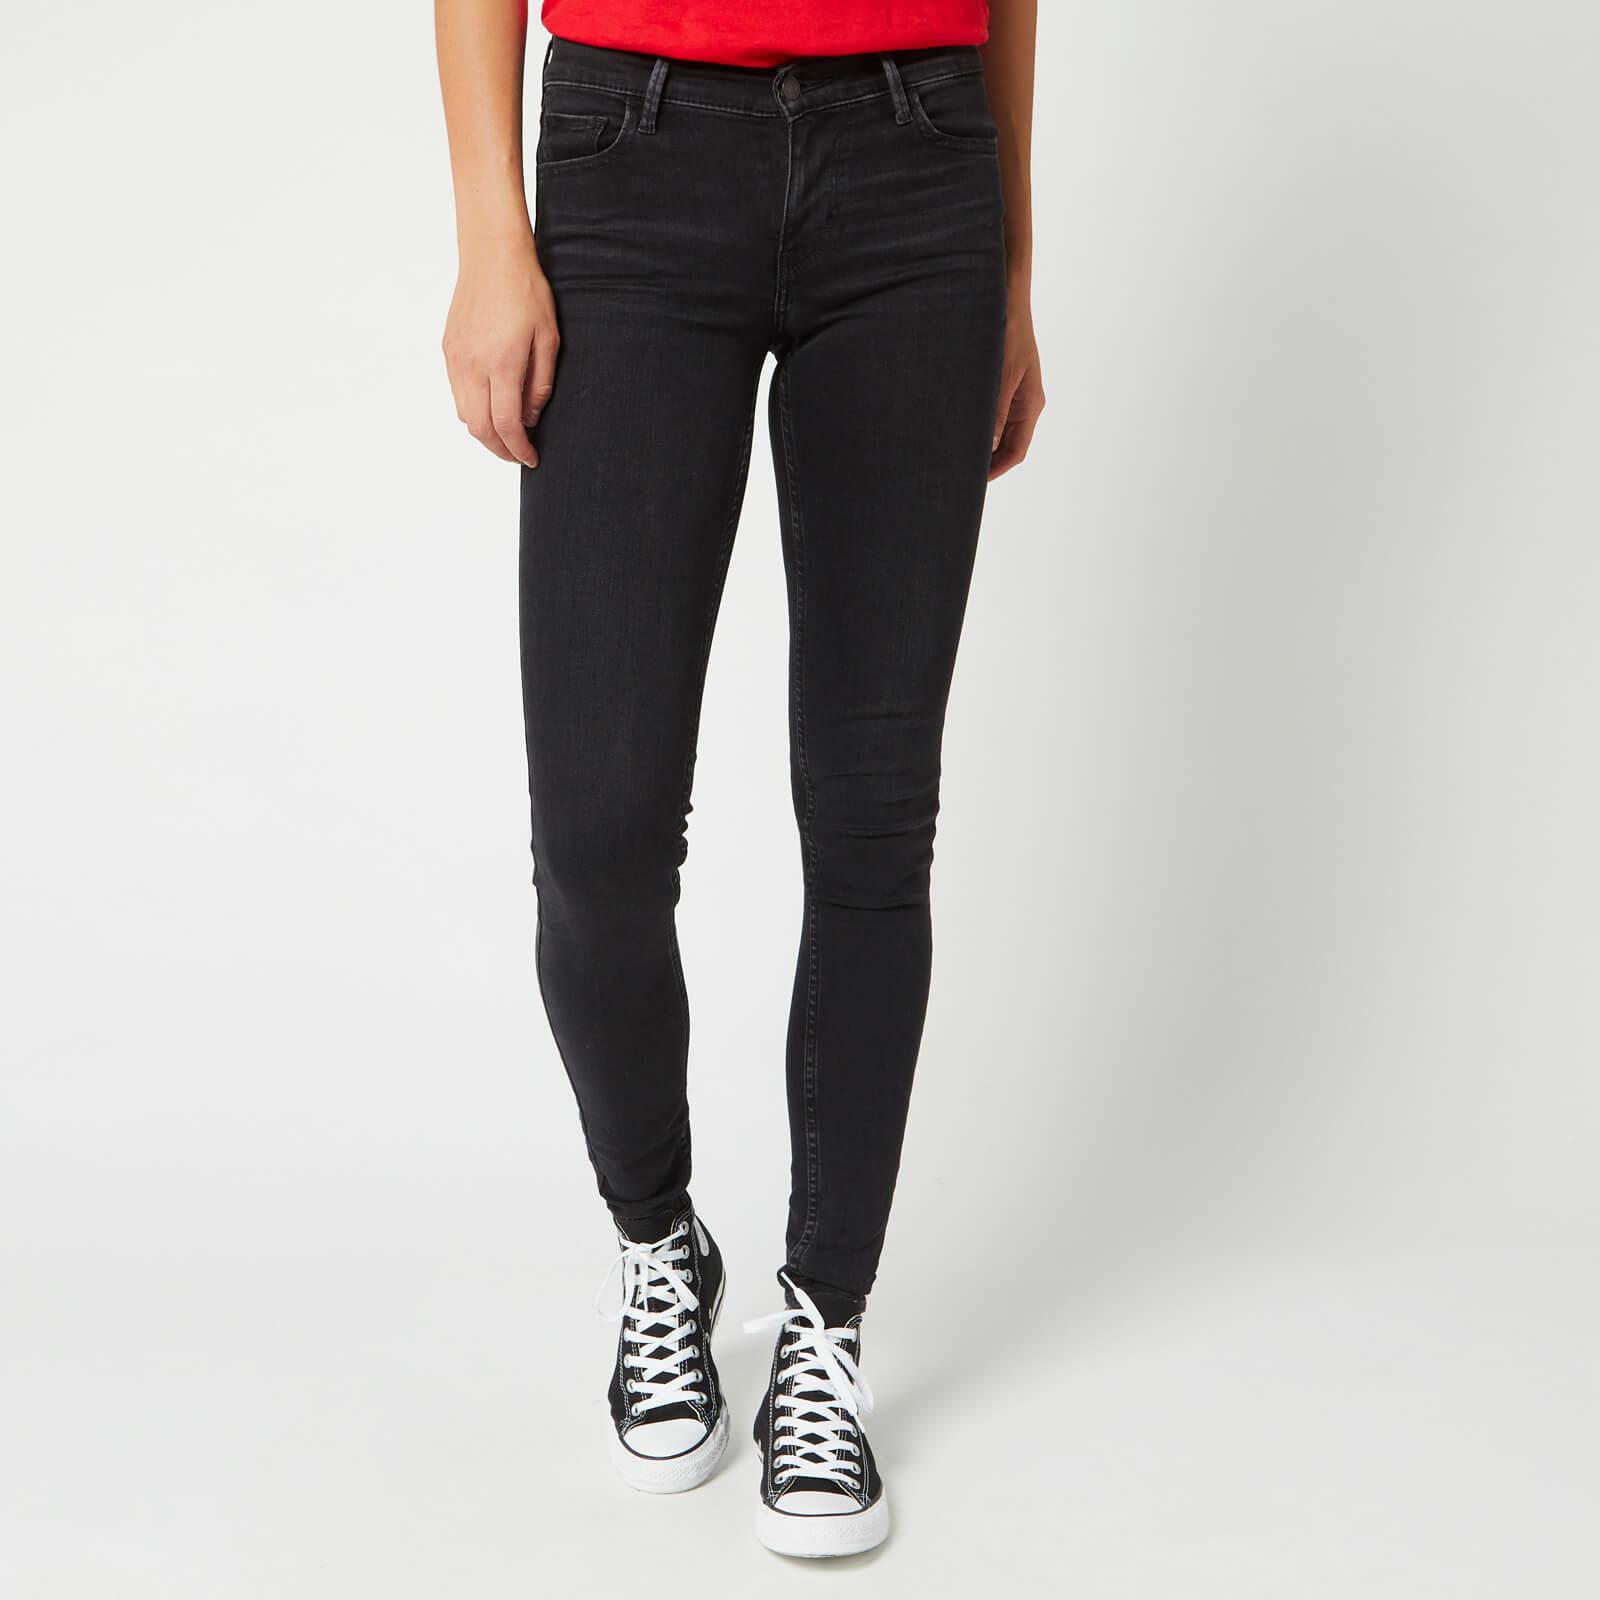 Levi's s Innovation Super Skinny Jeans - Freak Out - W29/L30